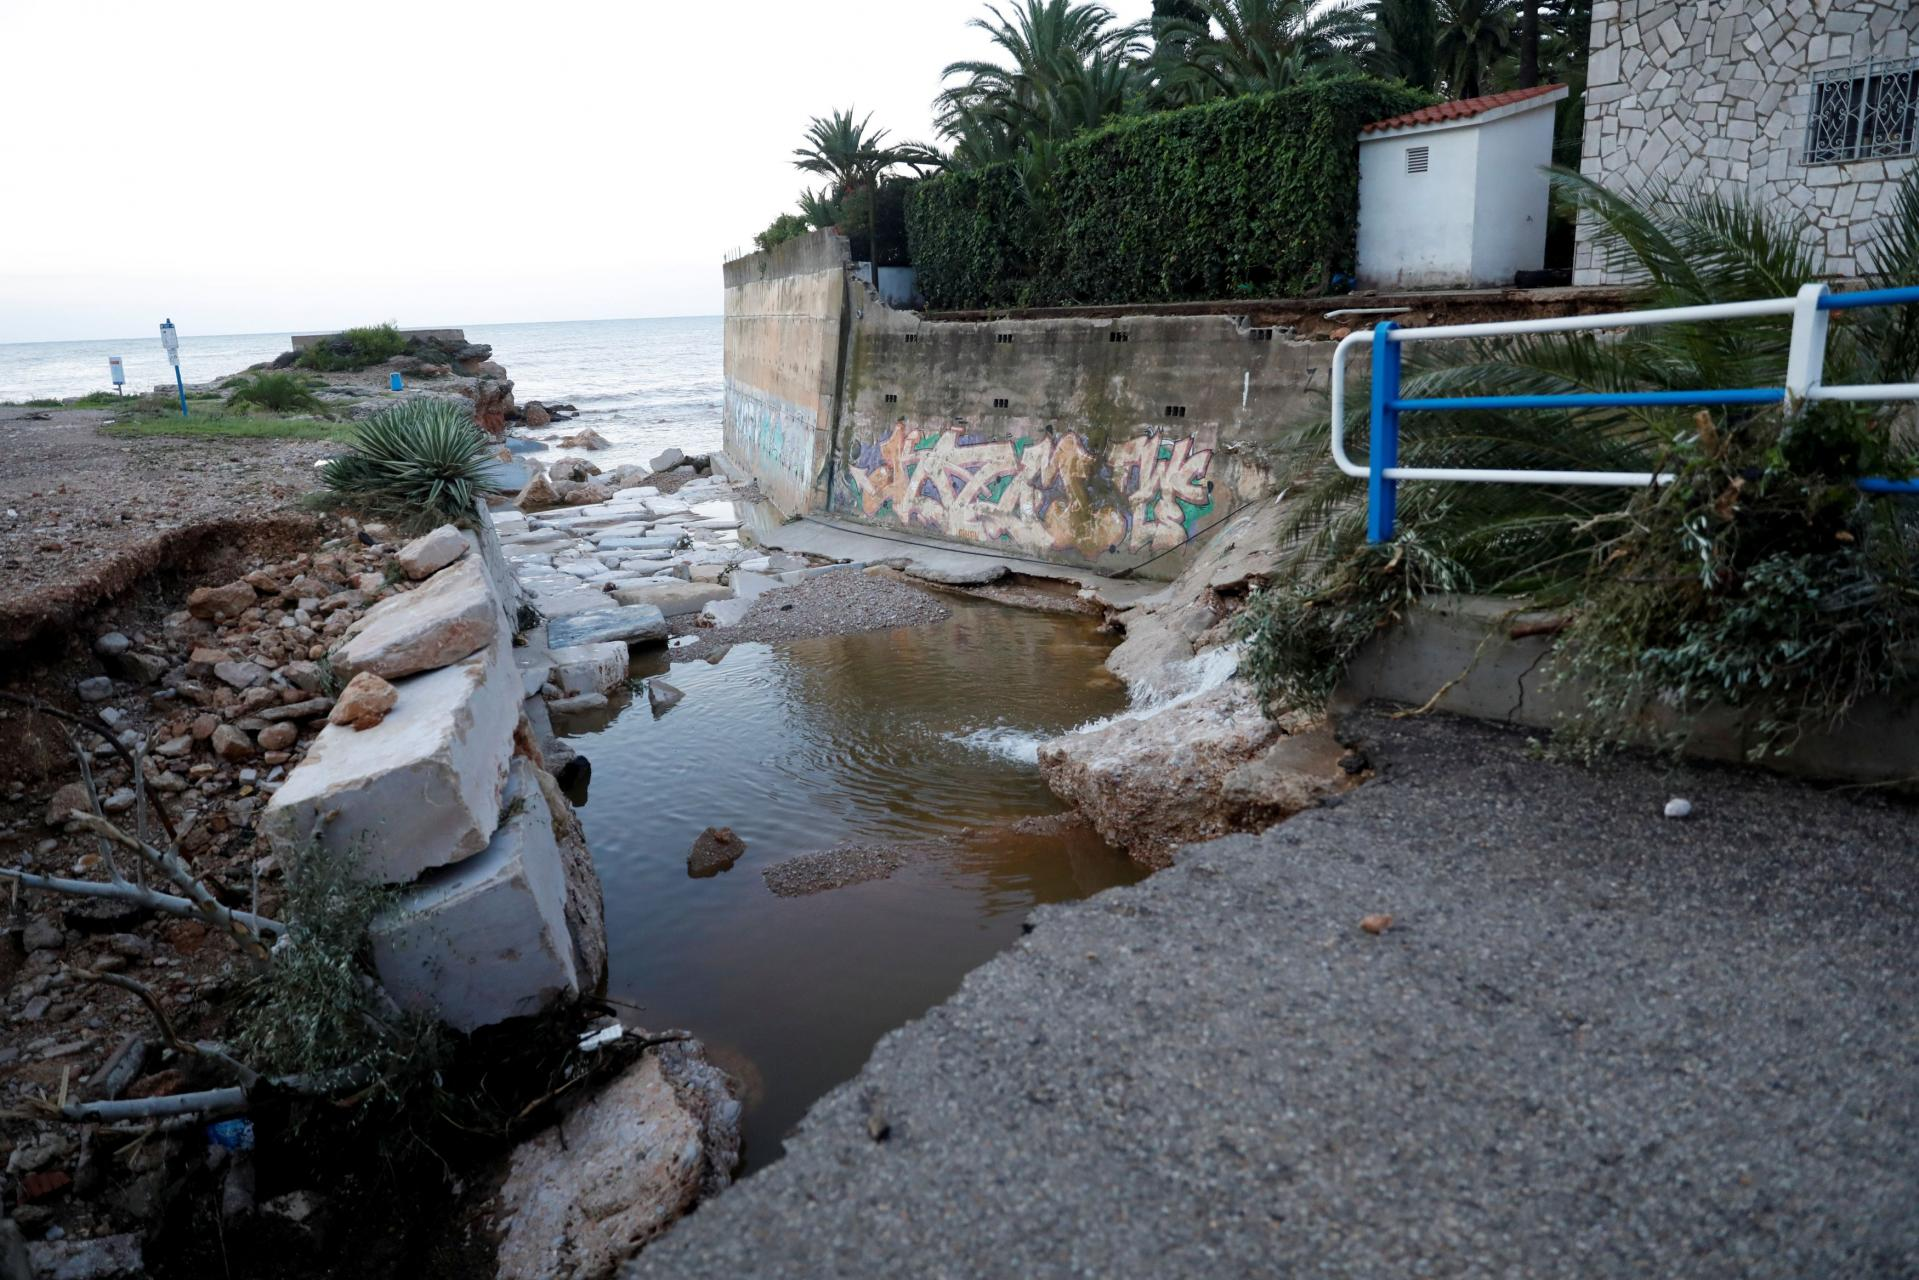 Floods aftermath in Vinaros